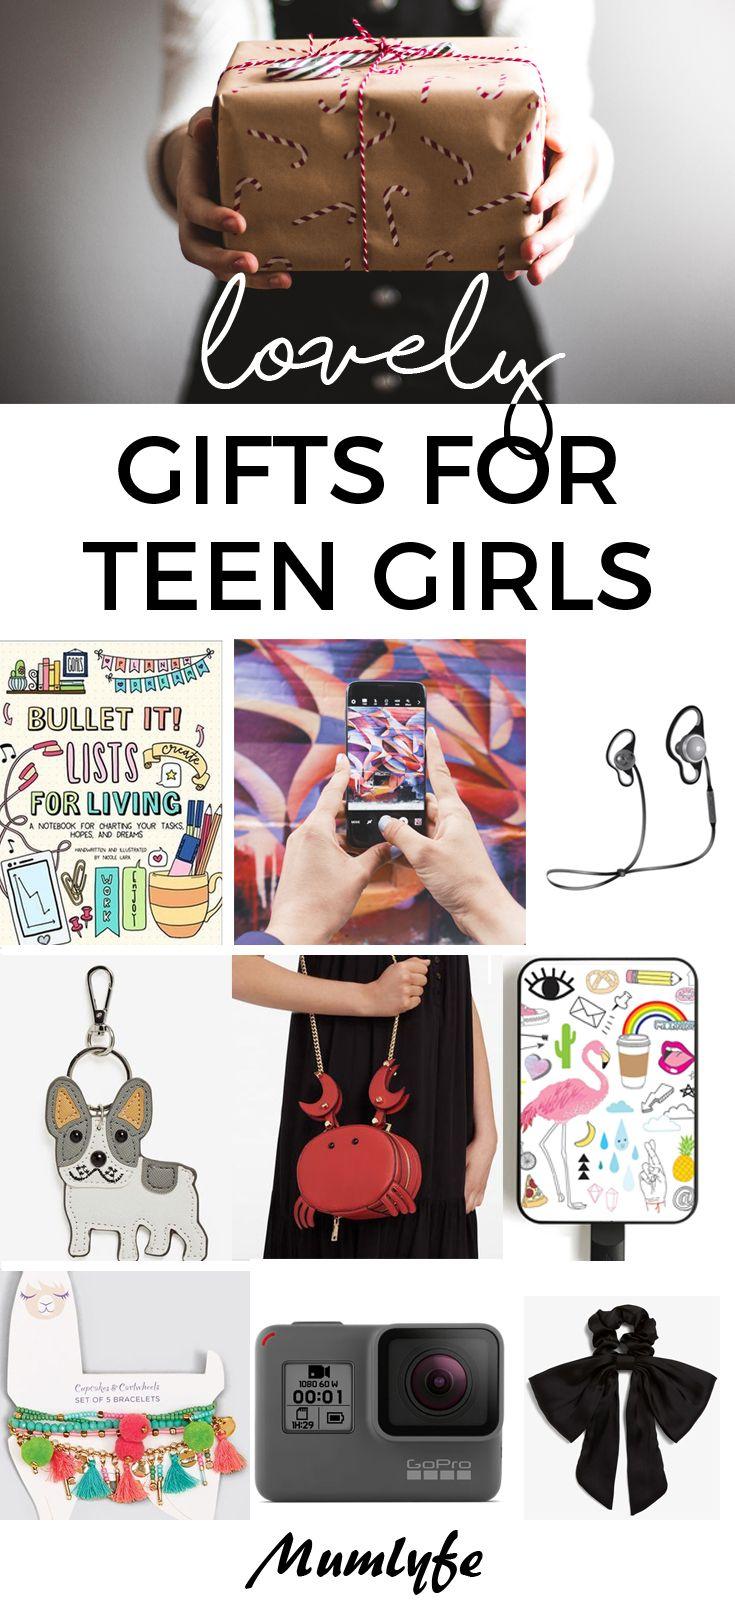 weird-gifts-for-teenage-girls